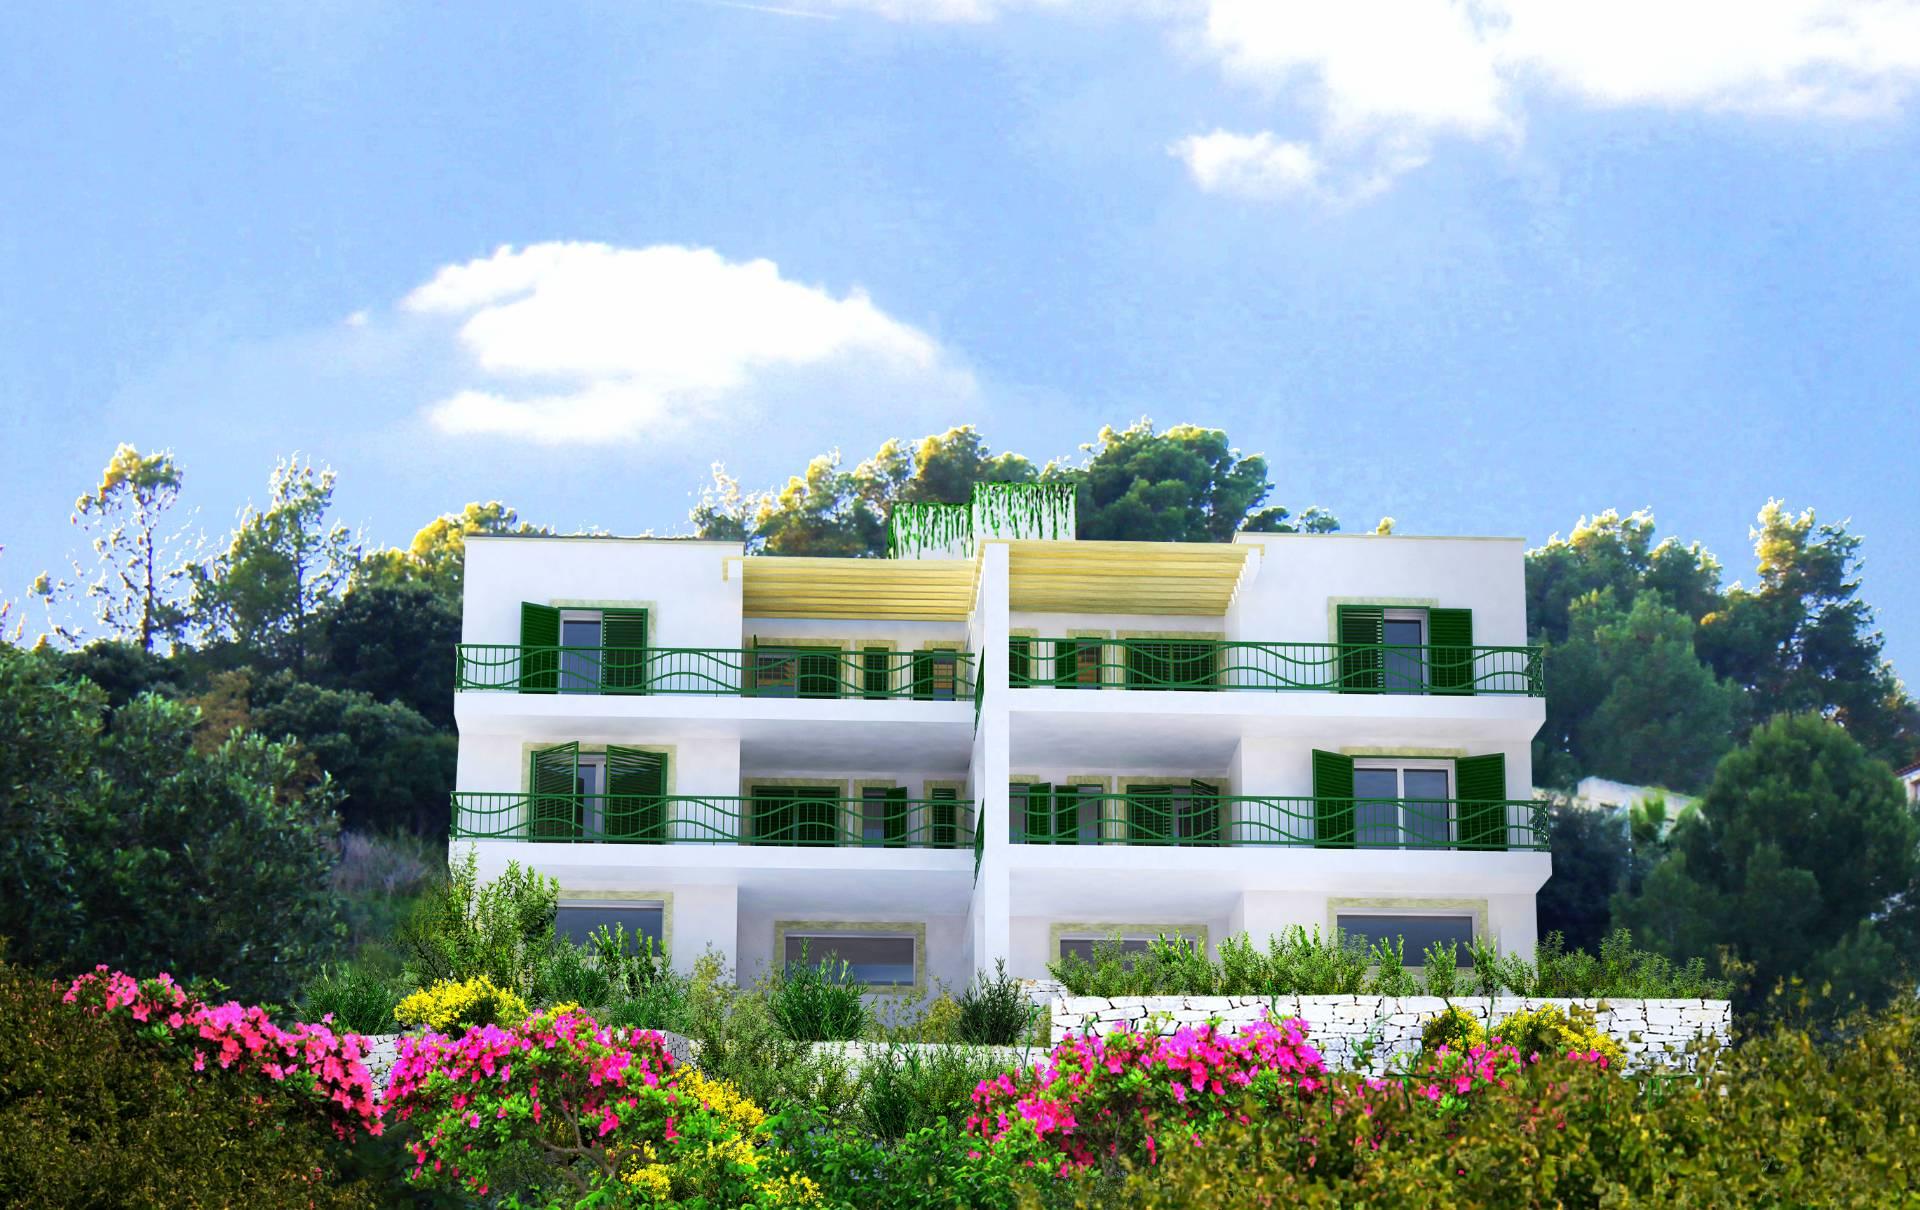 Appartamento in vendita a Ostuni, 10 locali, Trattative riservate | CambioCasa.it